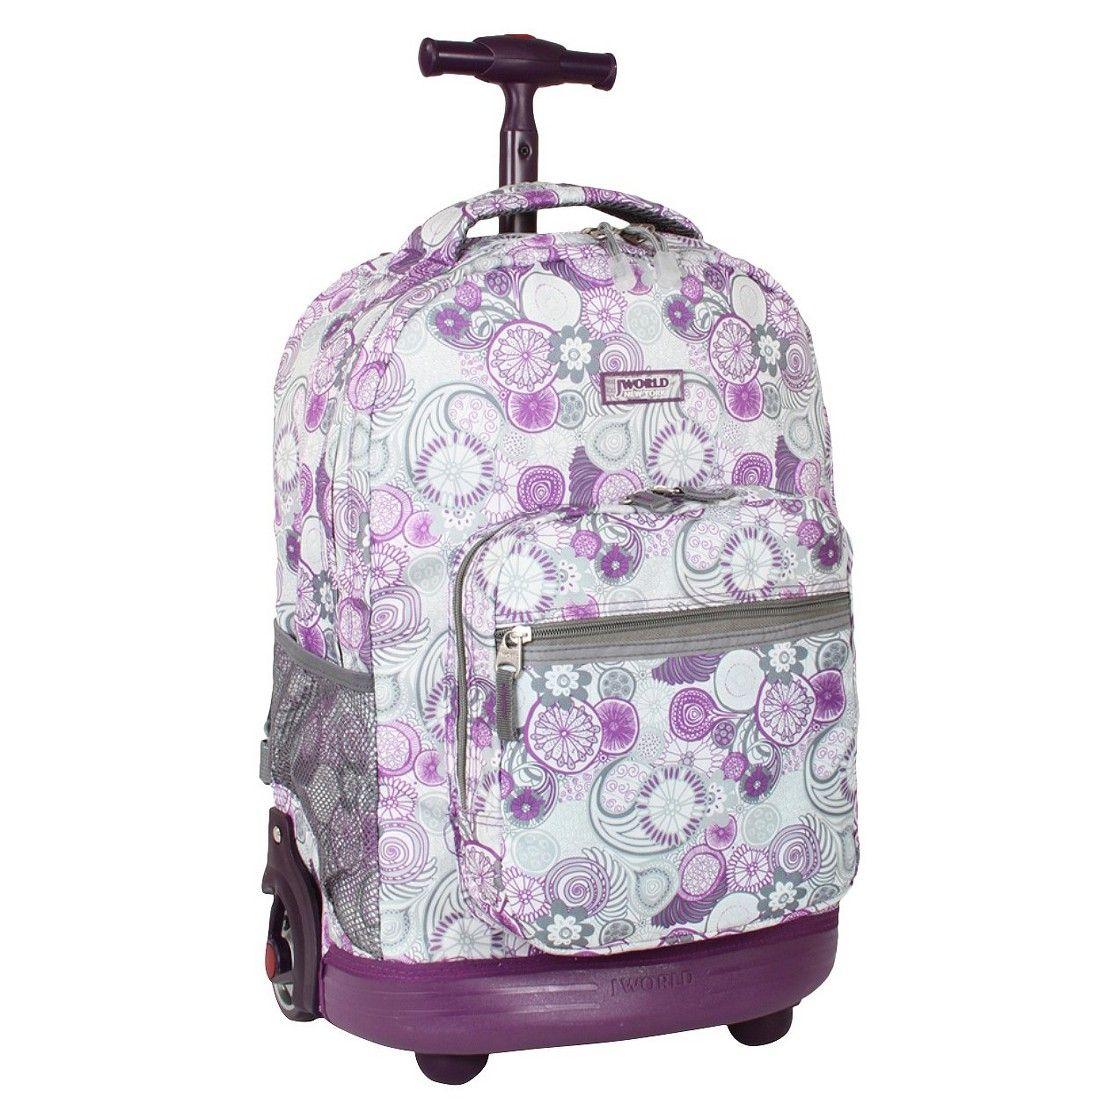 J World Sunrise Rolling Backpack - Lemon | School stuff ...